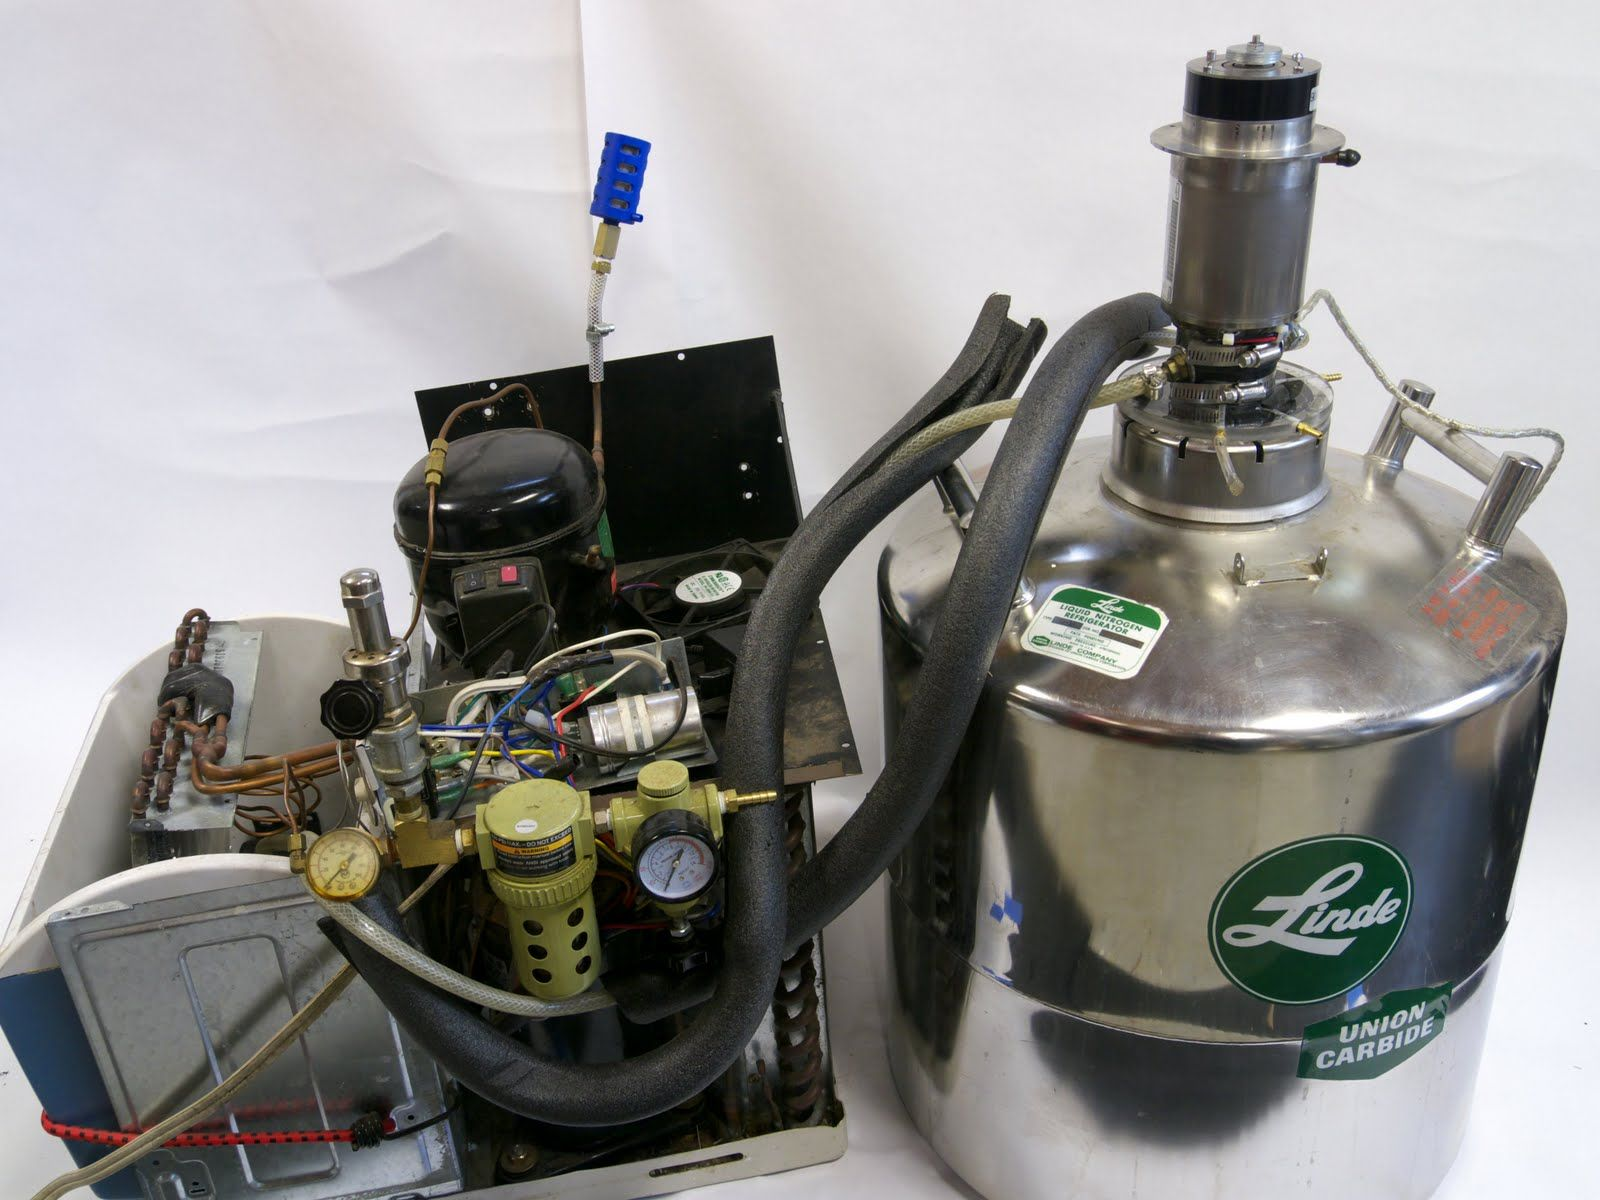 Slovenia Based Cpu Liquid Cooling Premium Gadget Maker Launched A